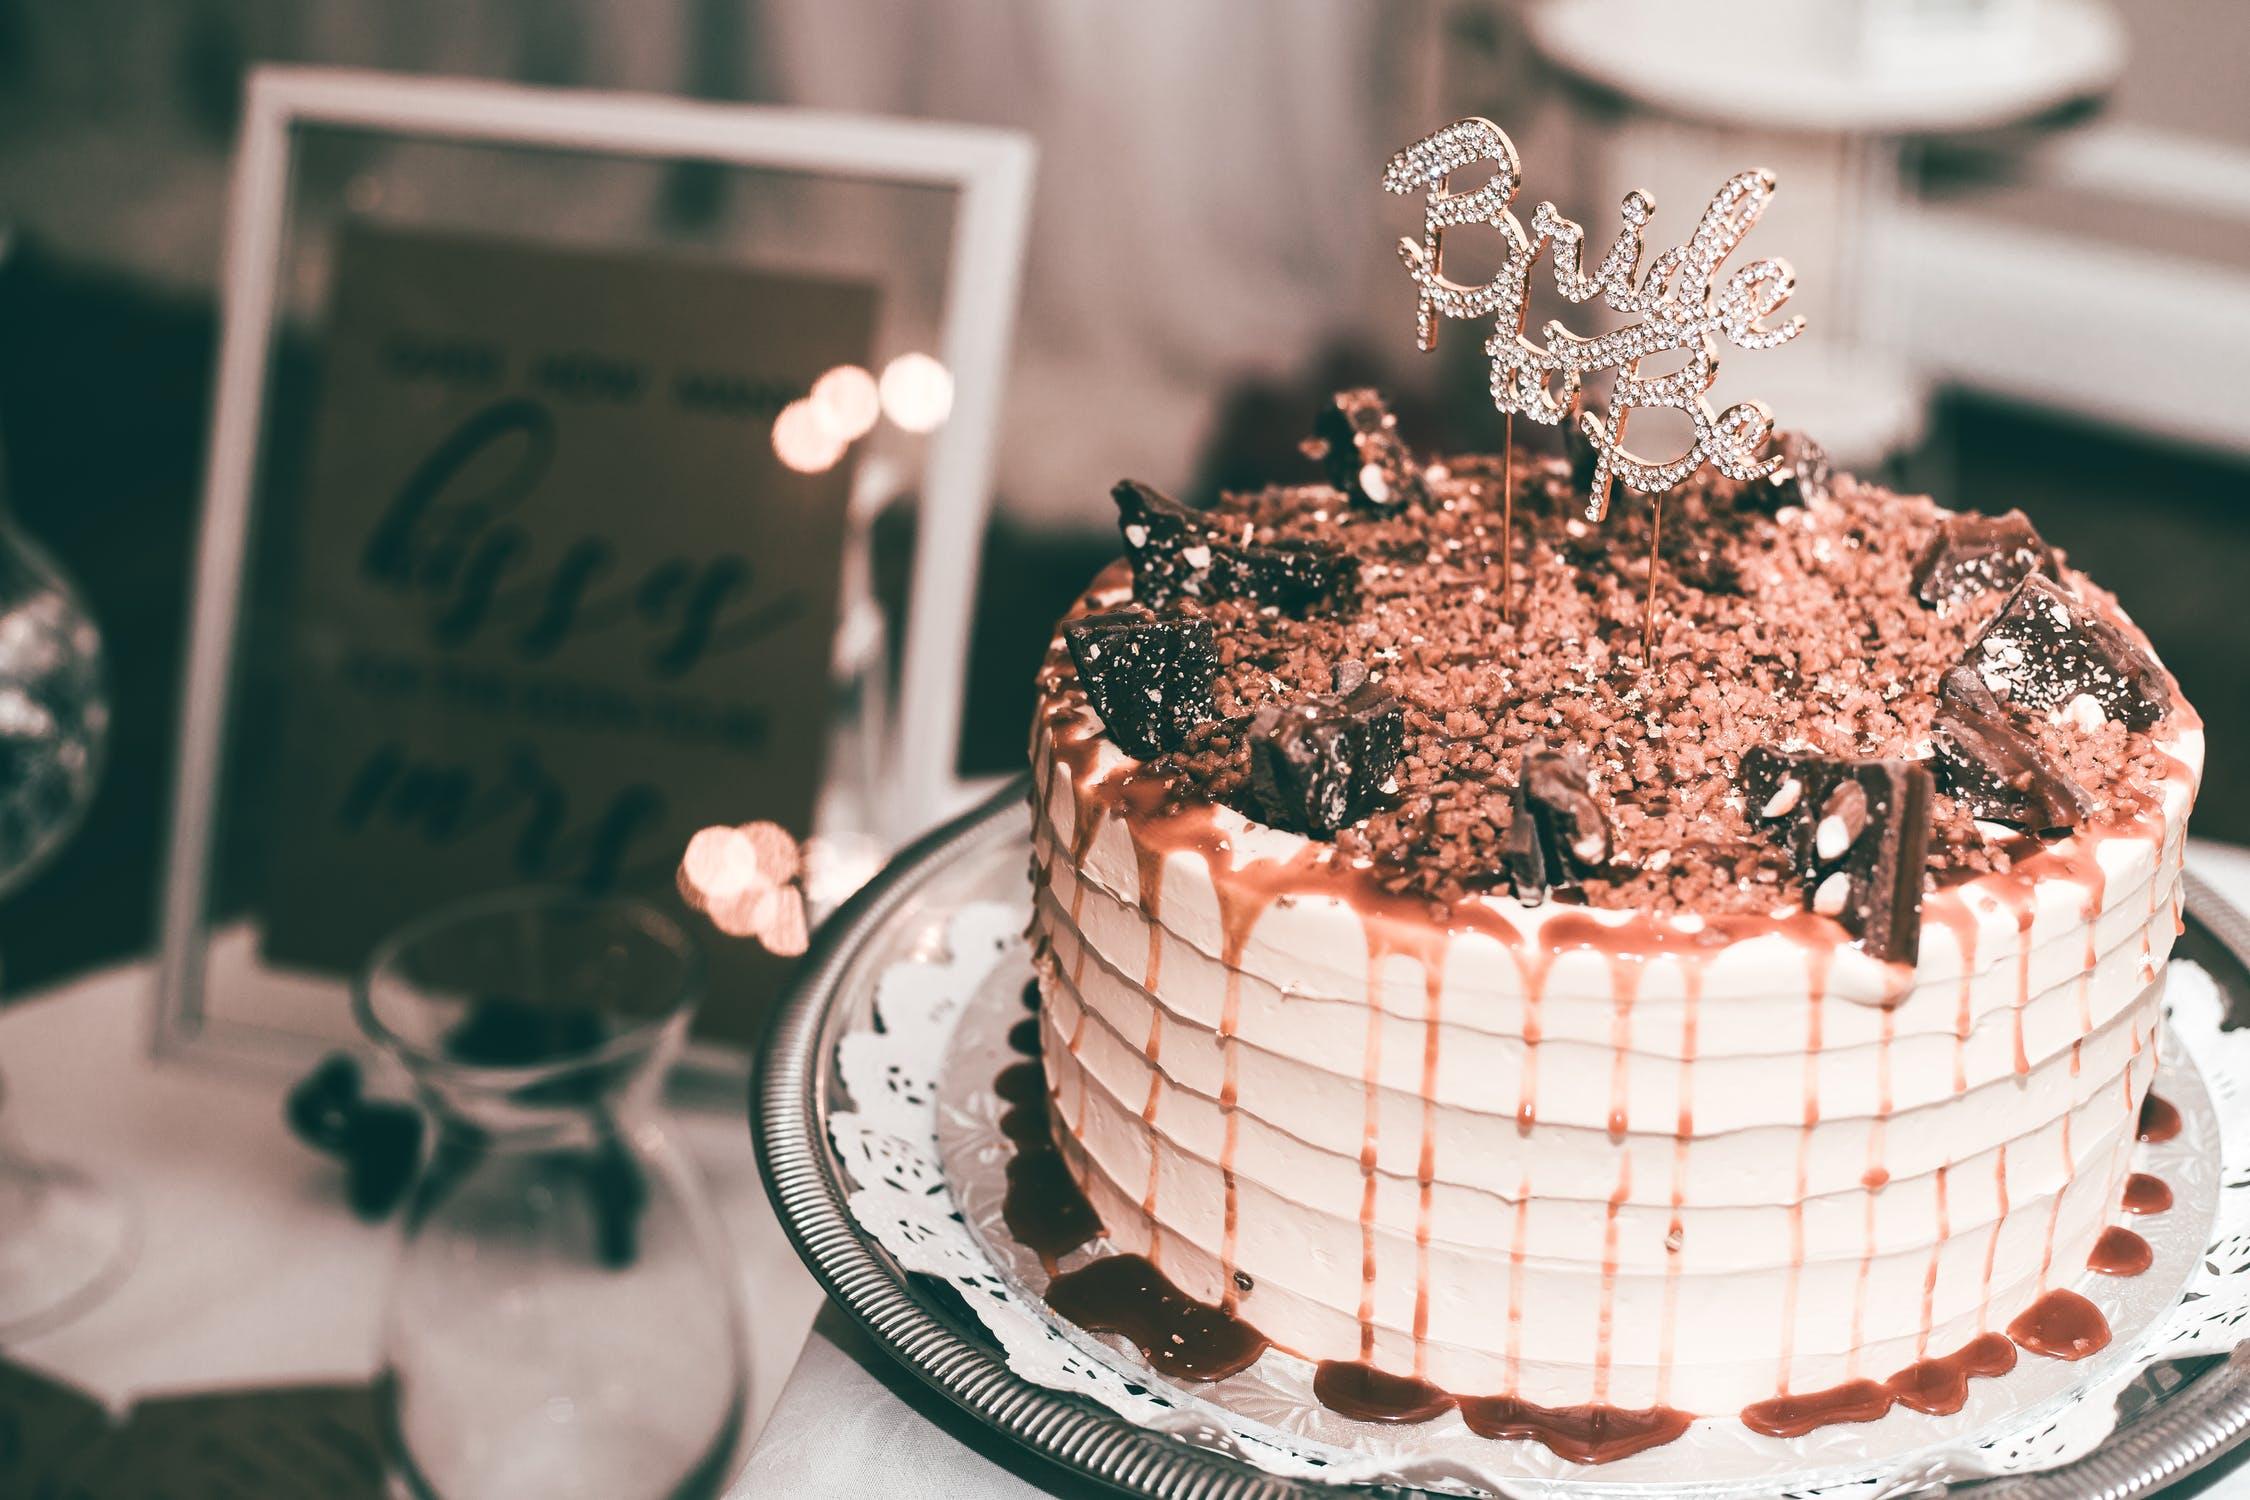 8 Fun Cake Designs For A Bridal Shower